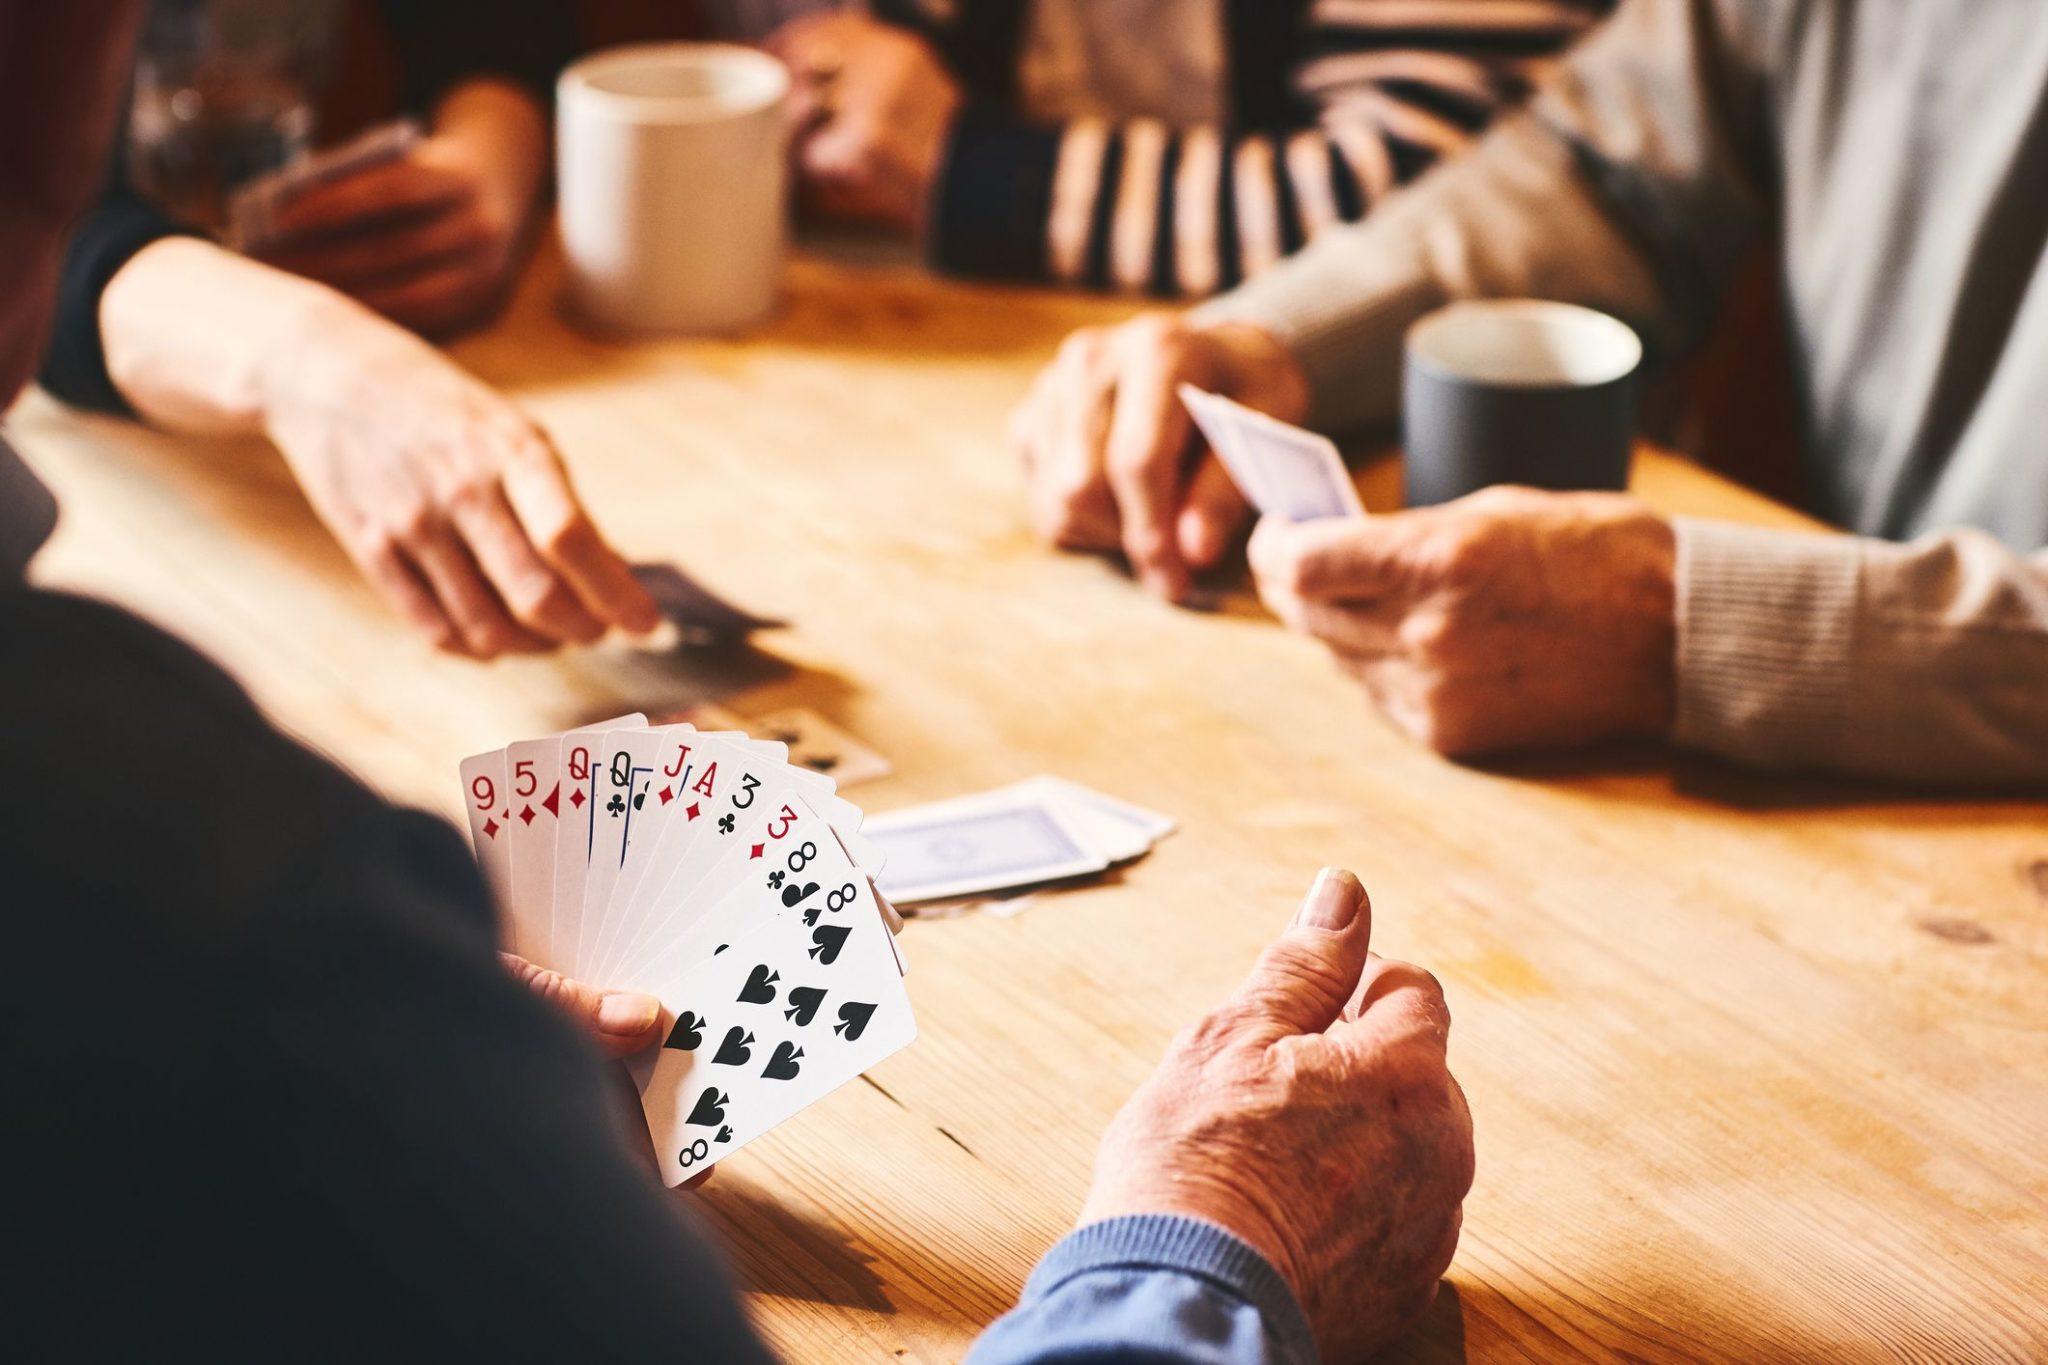 https://pokerplayersalliance.org/wp-content/uploads/2020/04/Playing-Card-Games-2048x1365.jpg